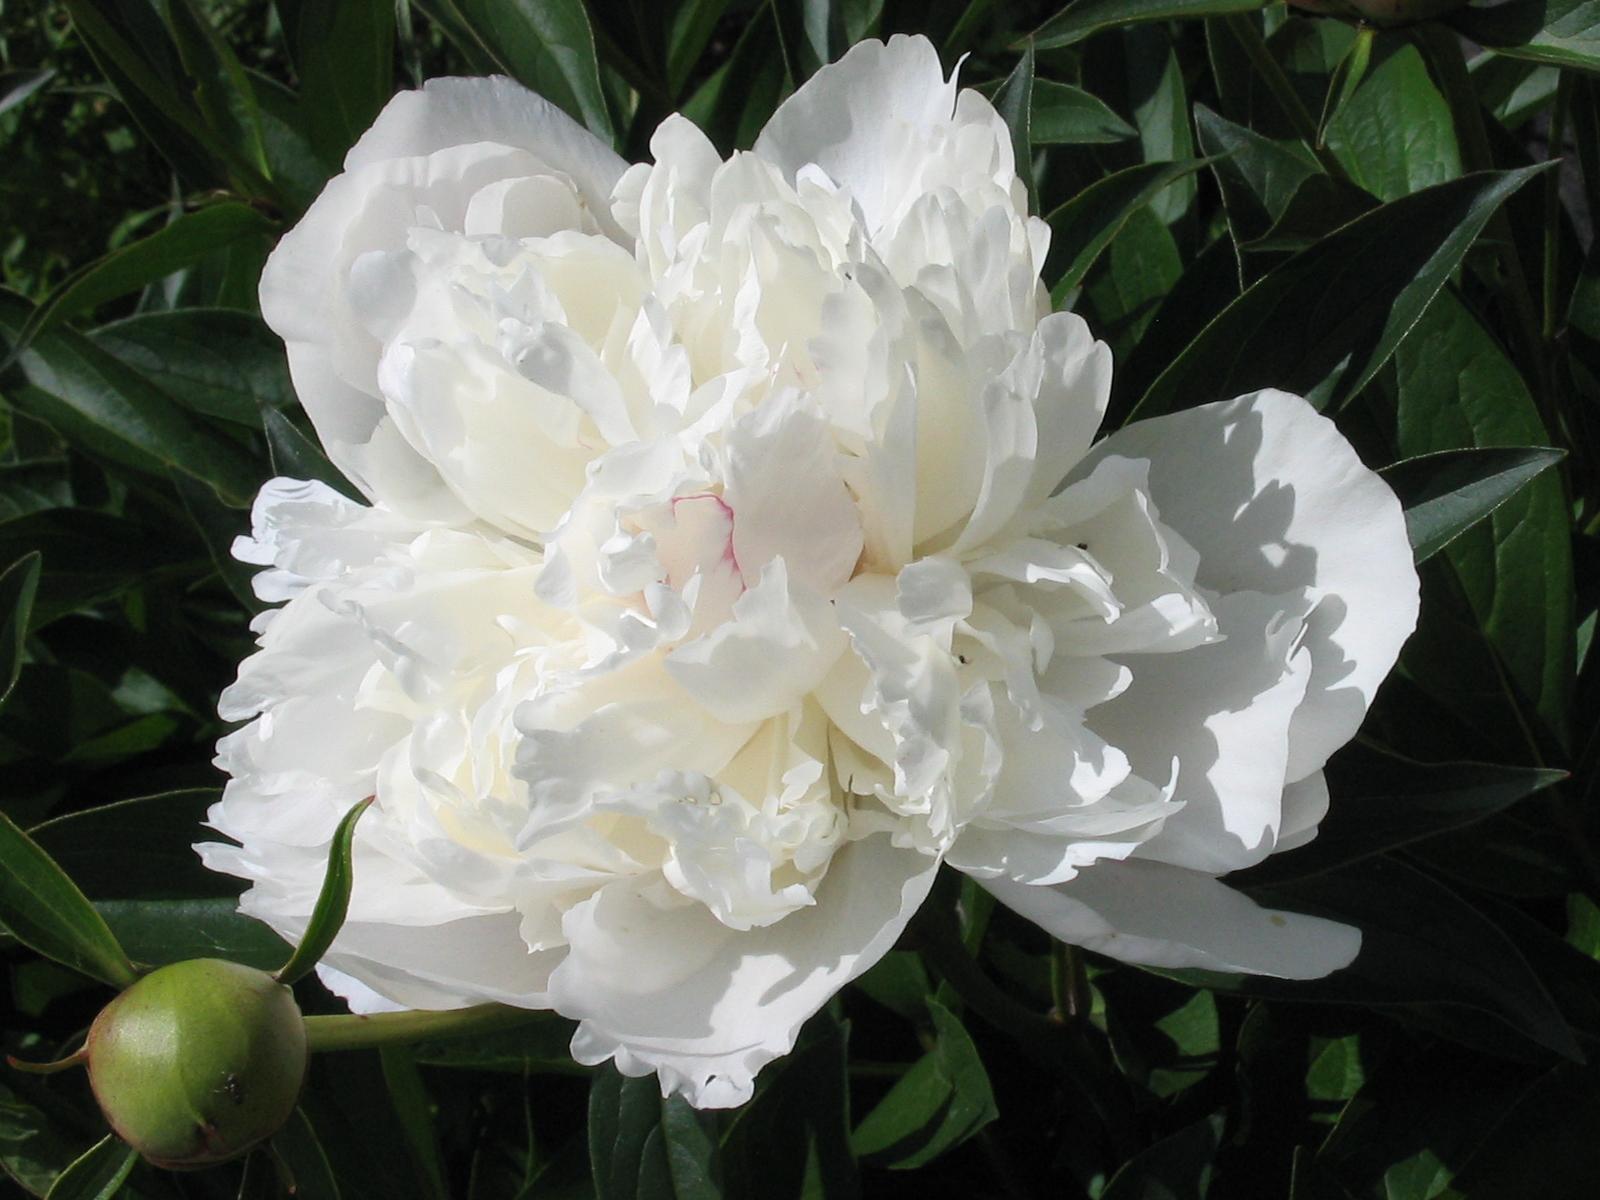 English: White peony flower Русский: Цветок бе...